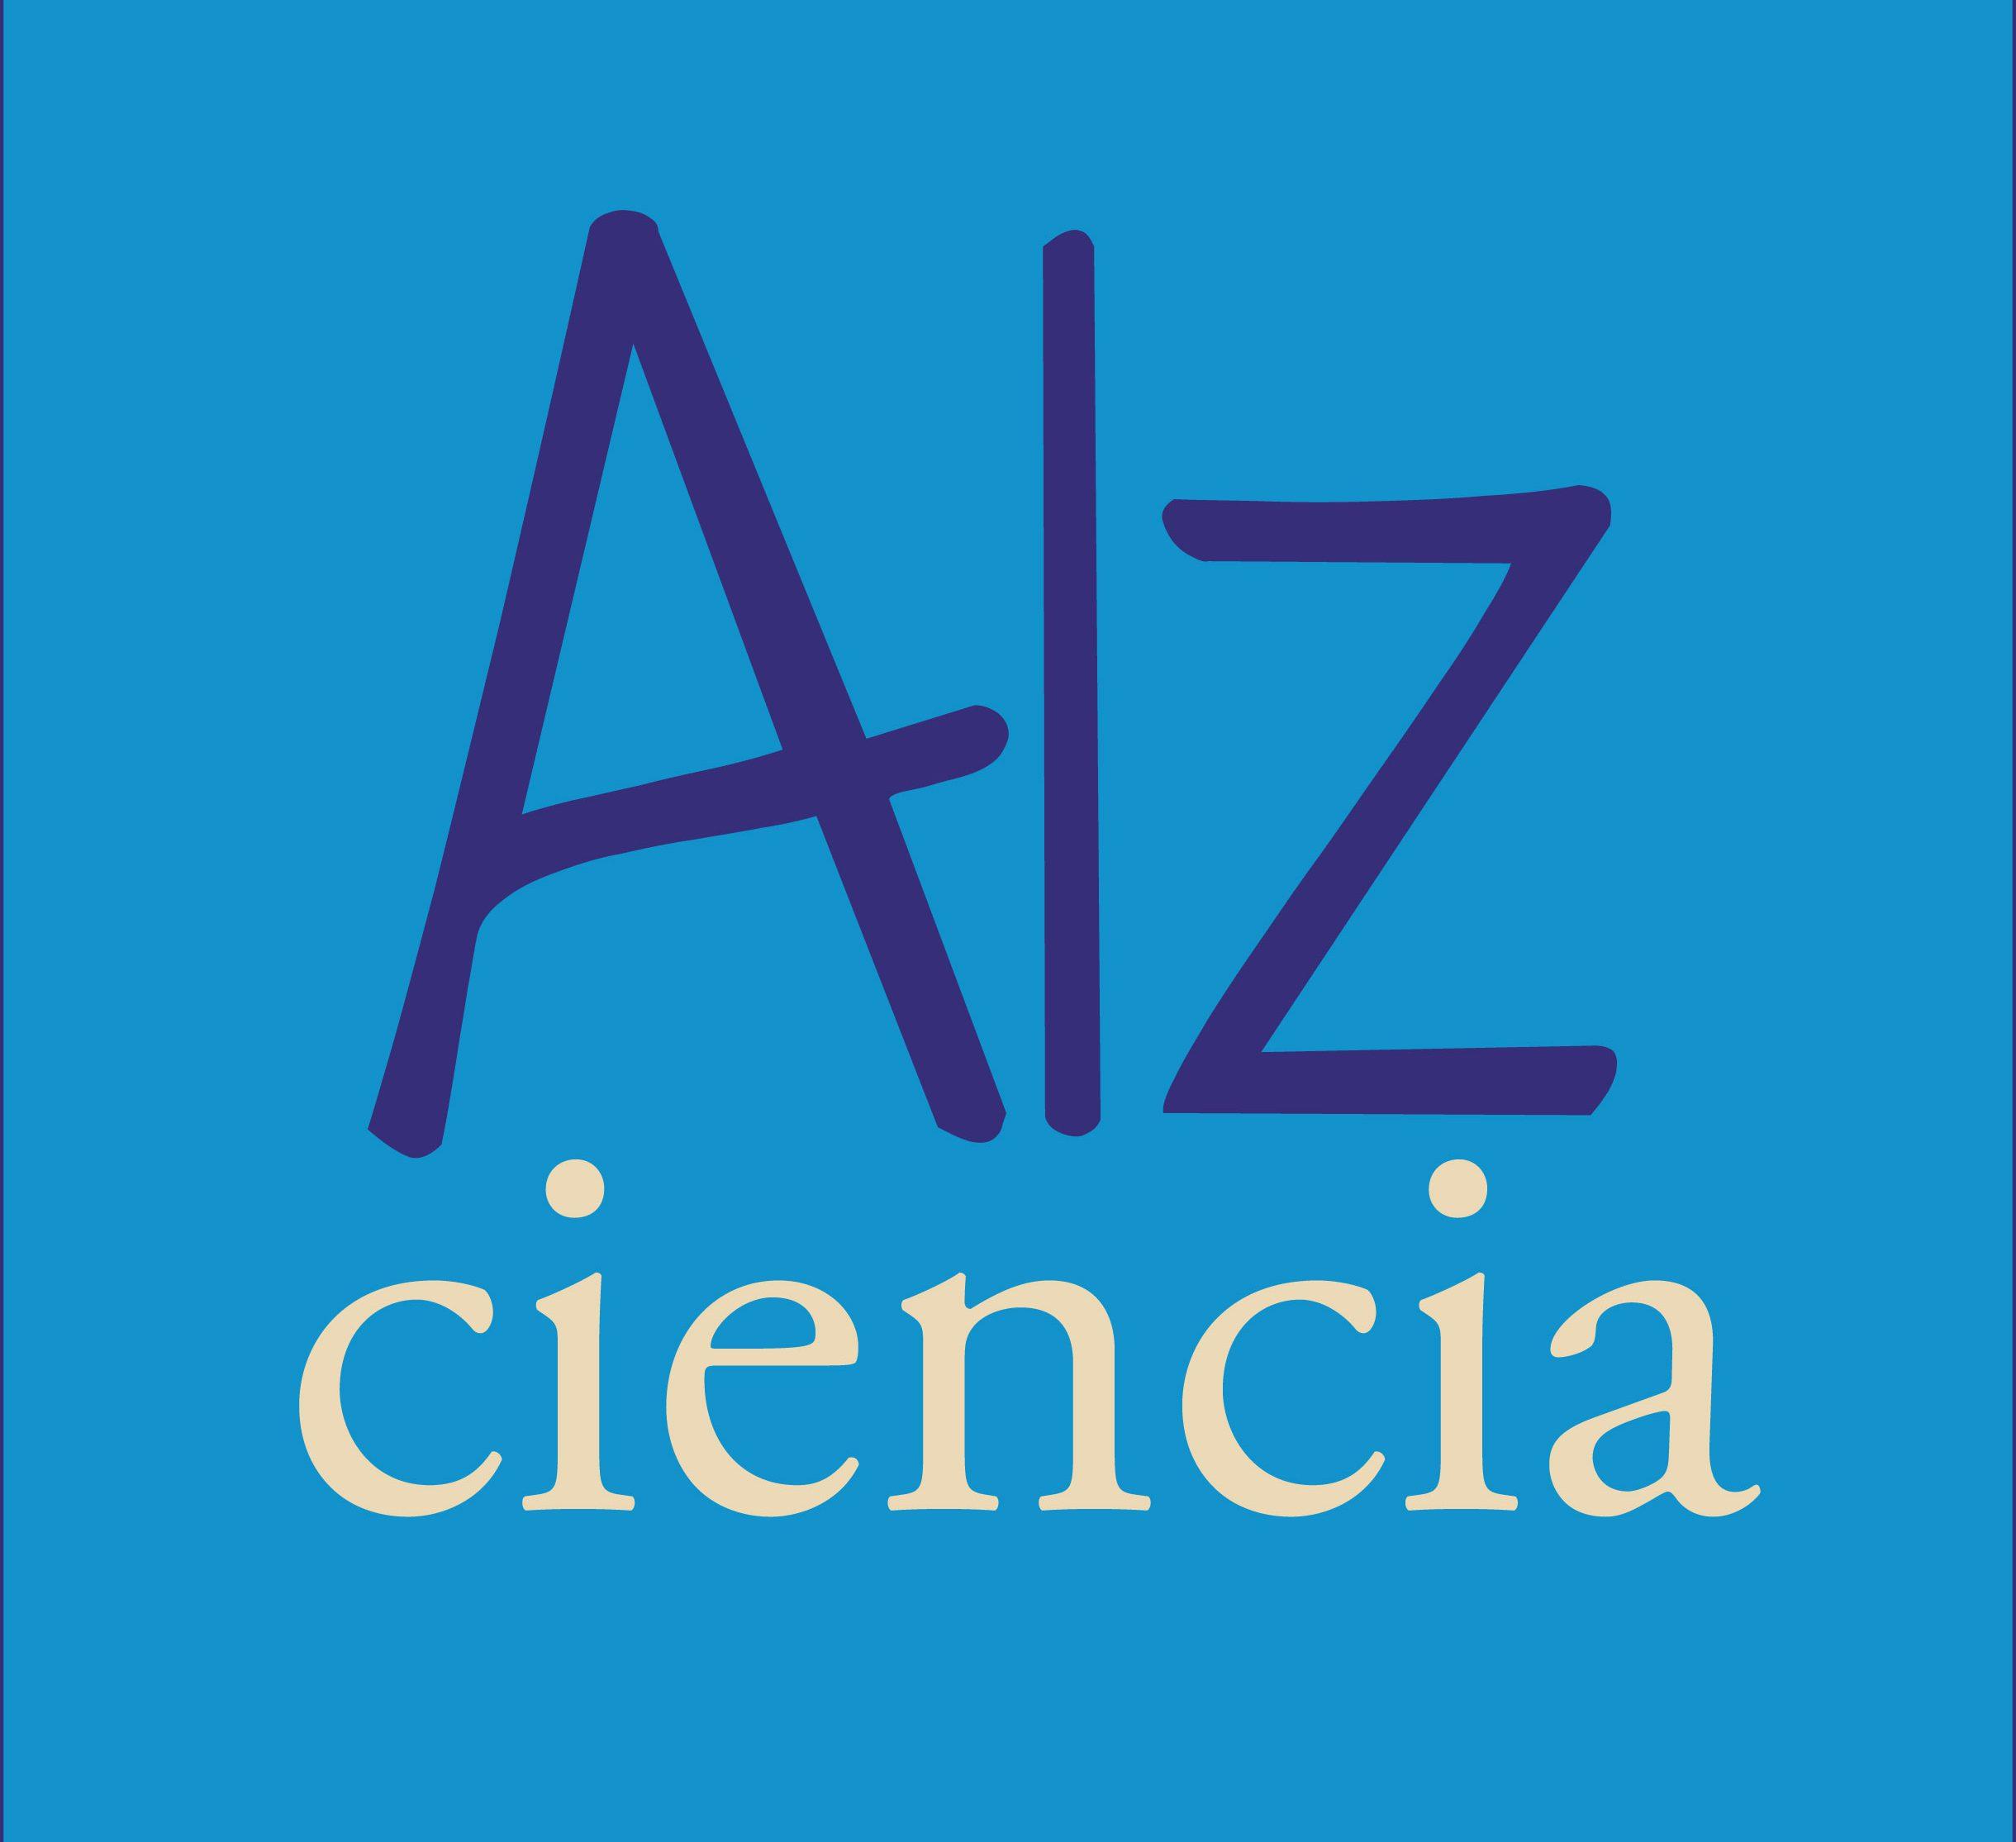 Alzciencia.com